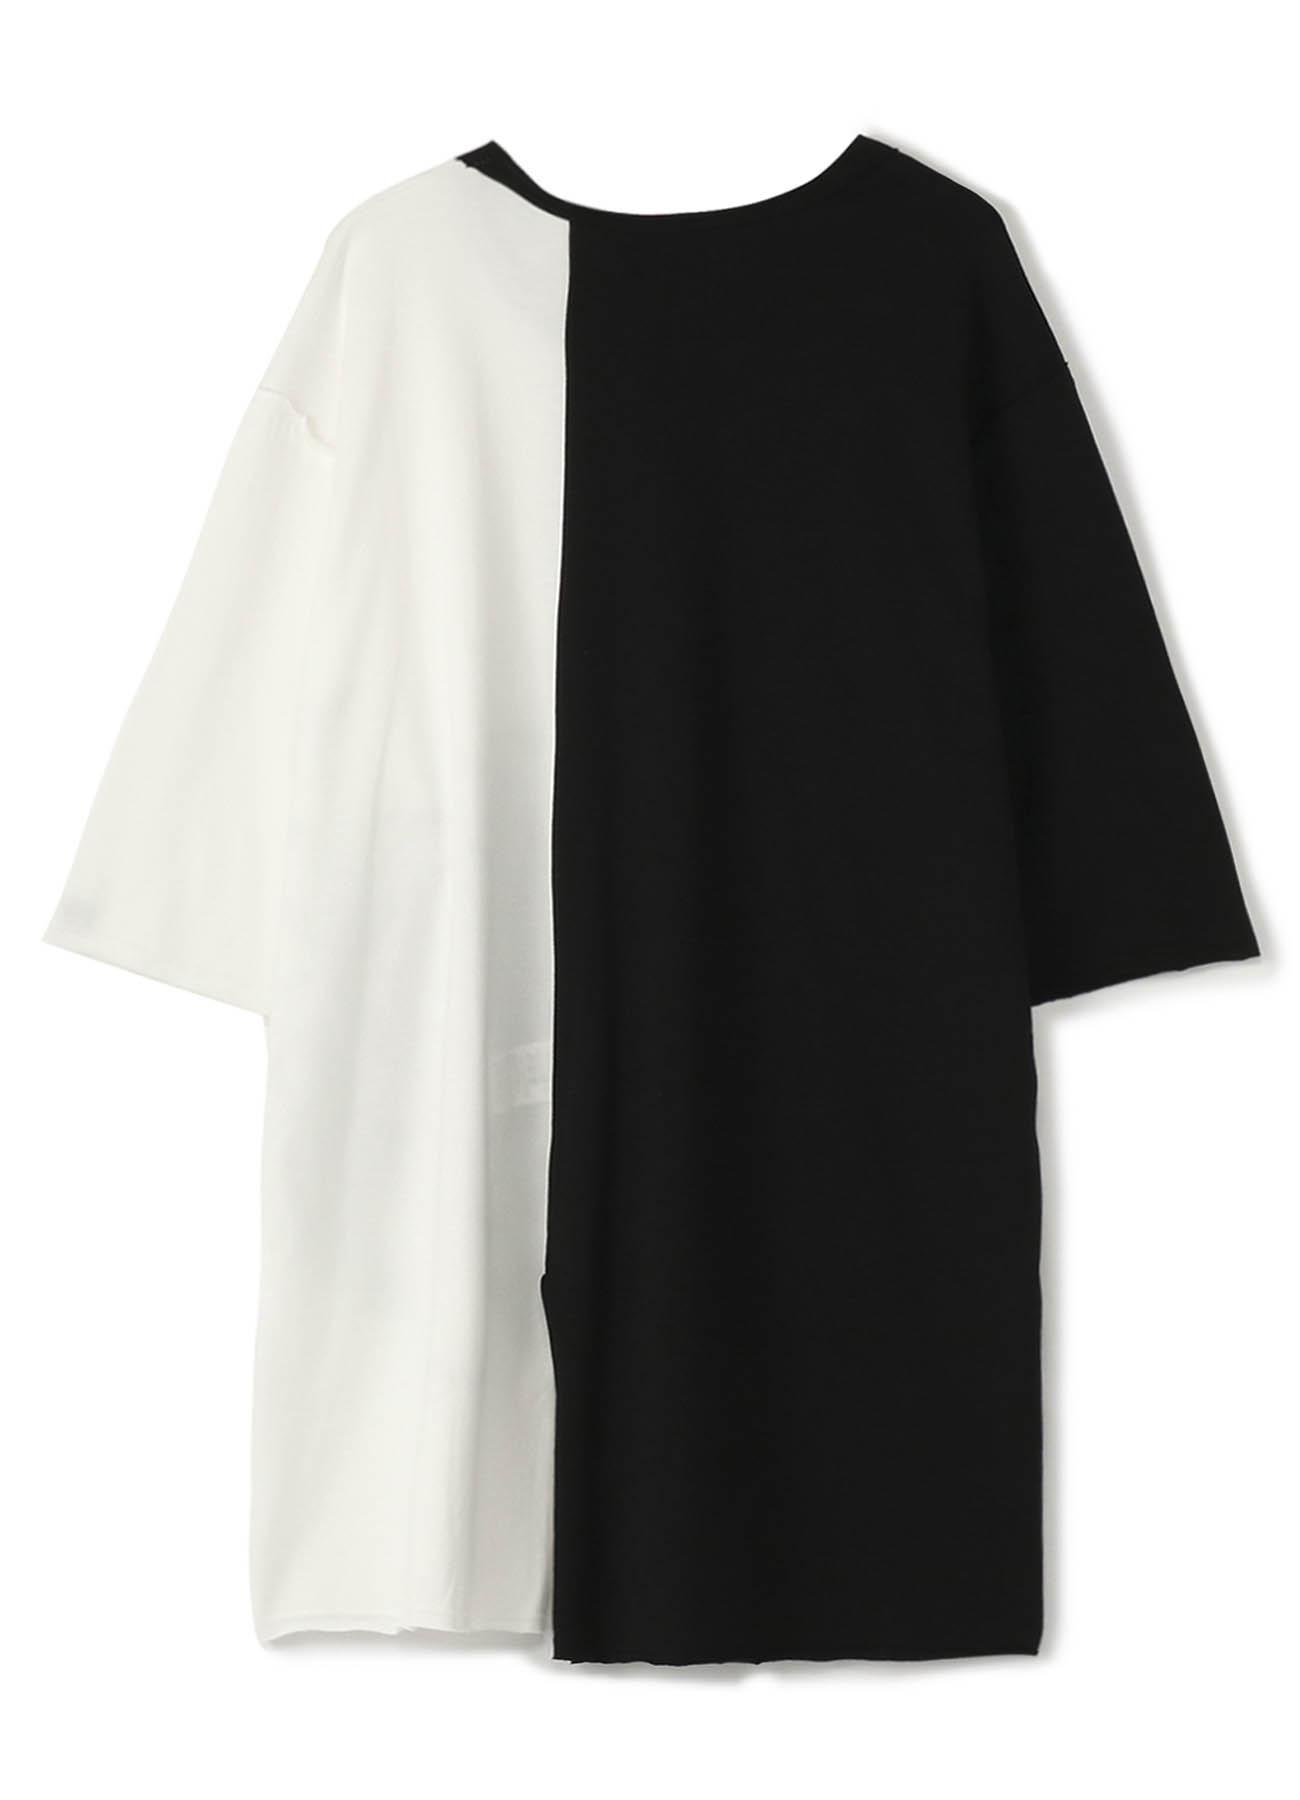 40/2 Cotton Jersey Stitching Slit Big Flower Black & White T-shirt